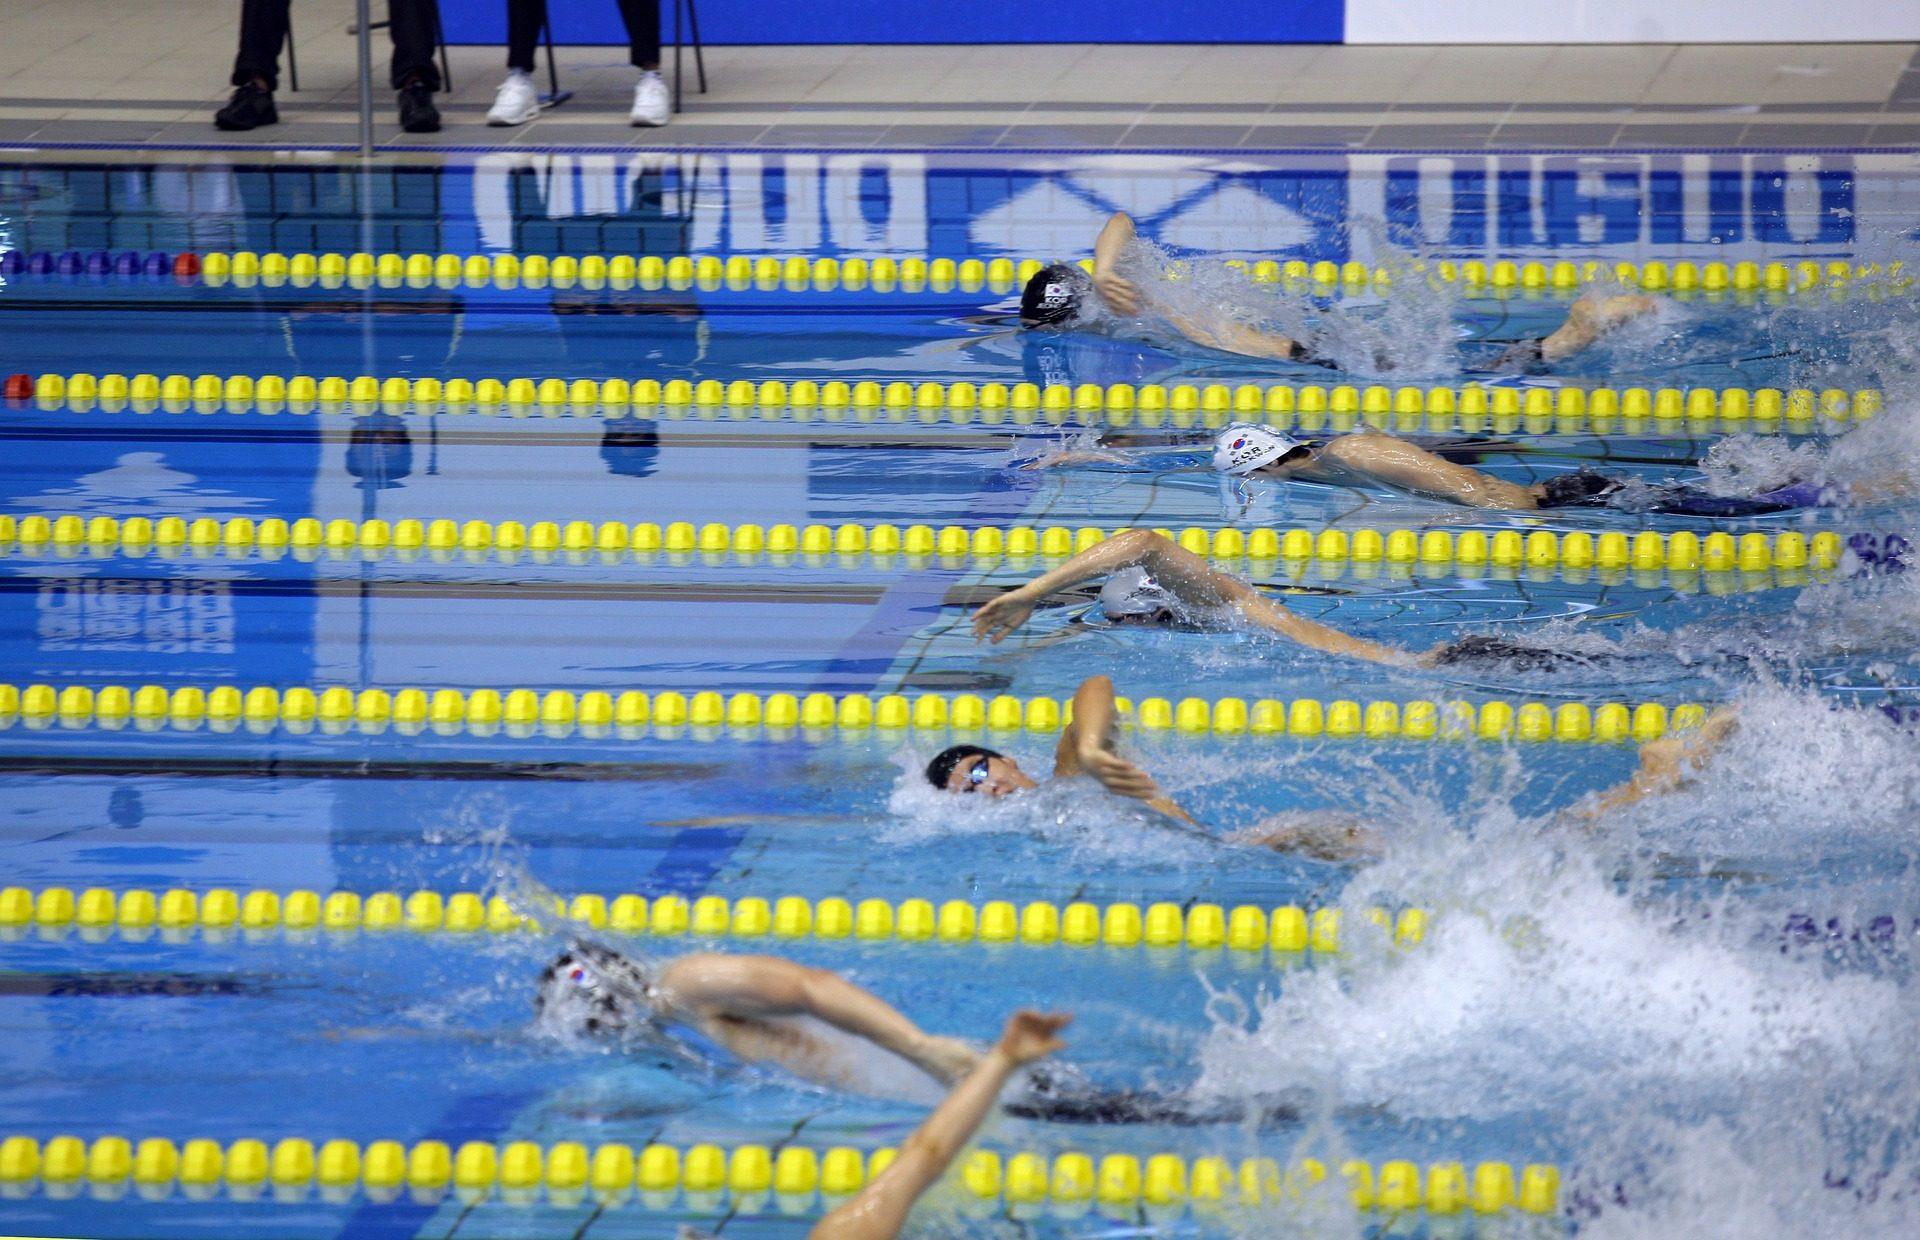 Fondo de pantalla de competici n piscina nataci n for Piscina de natacion